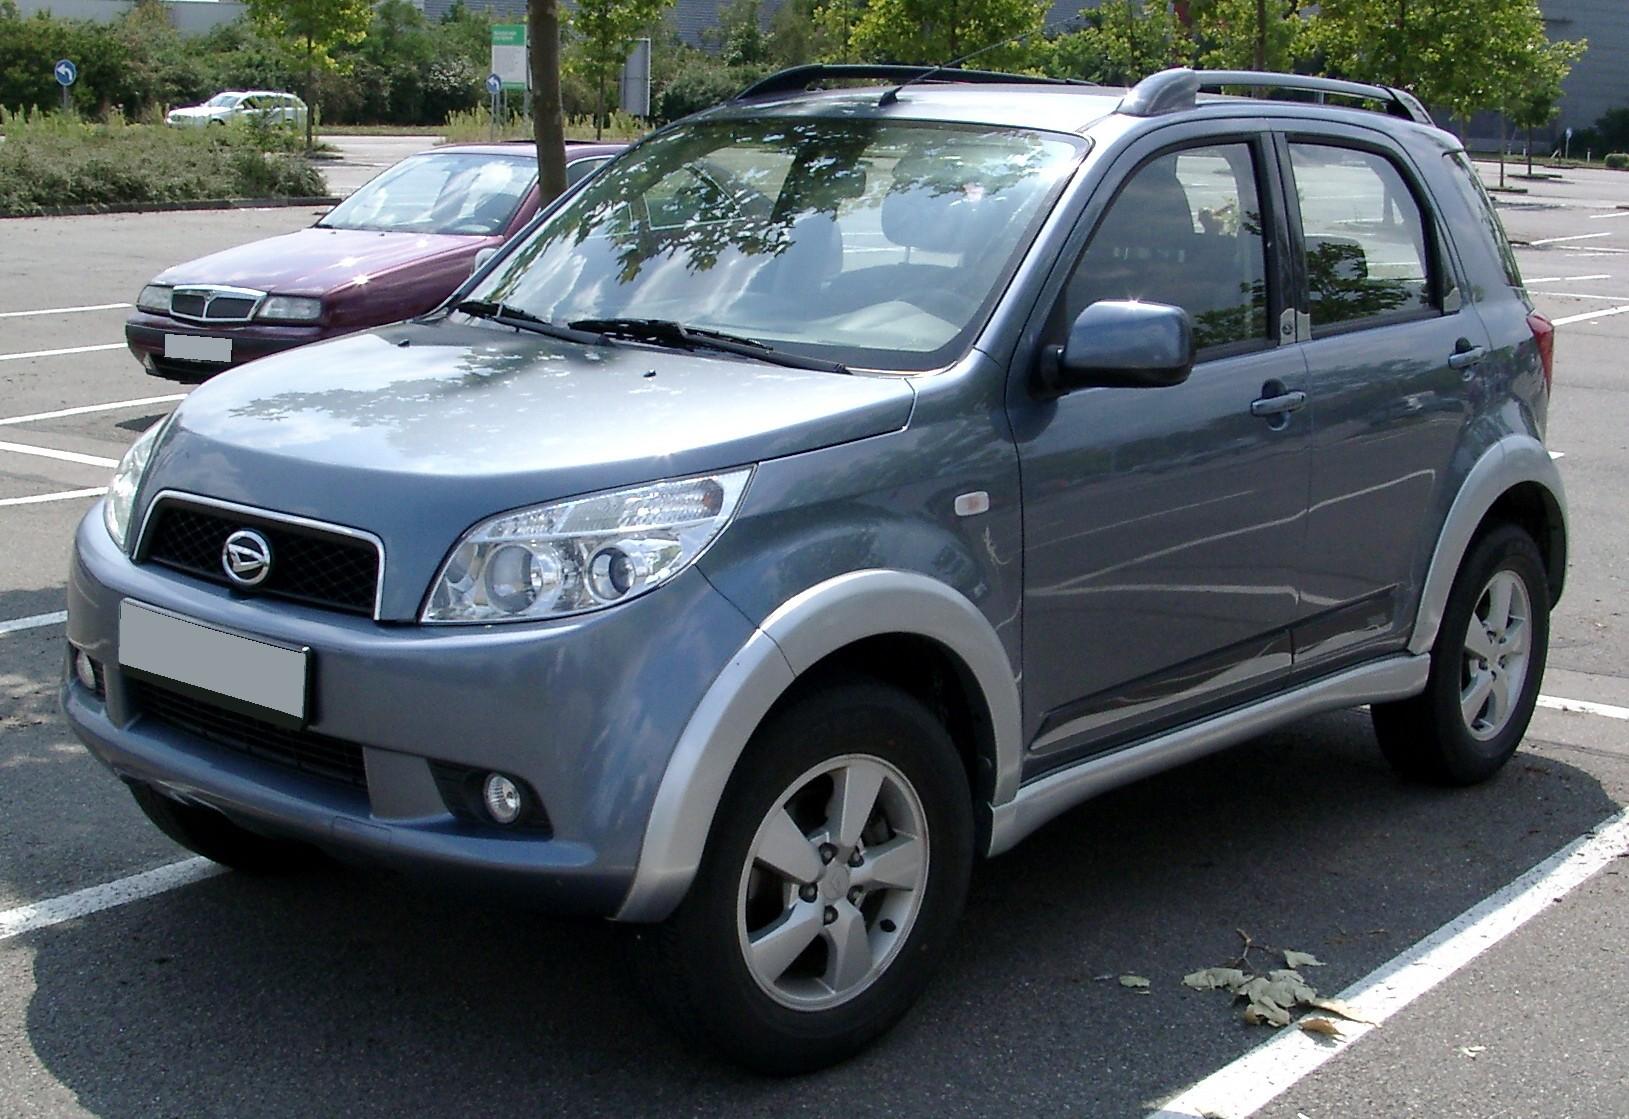 Suzuki Sx Awd For Sale South Africa